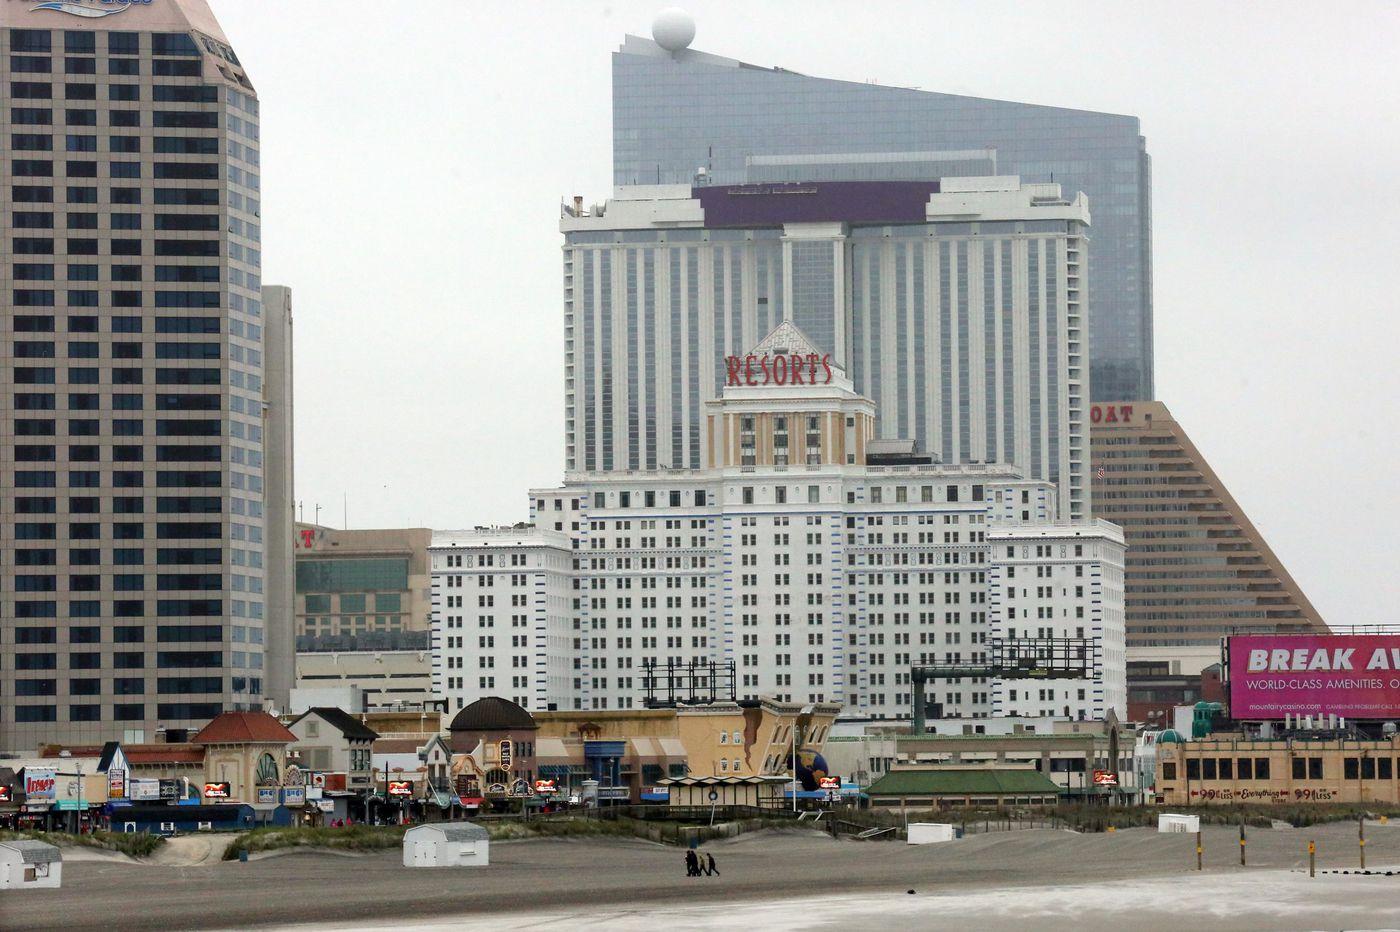 Atlantic City's Resorts sportsbook set to open Wednesday